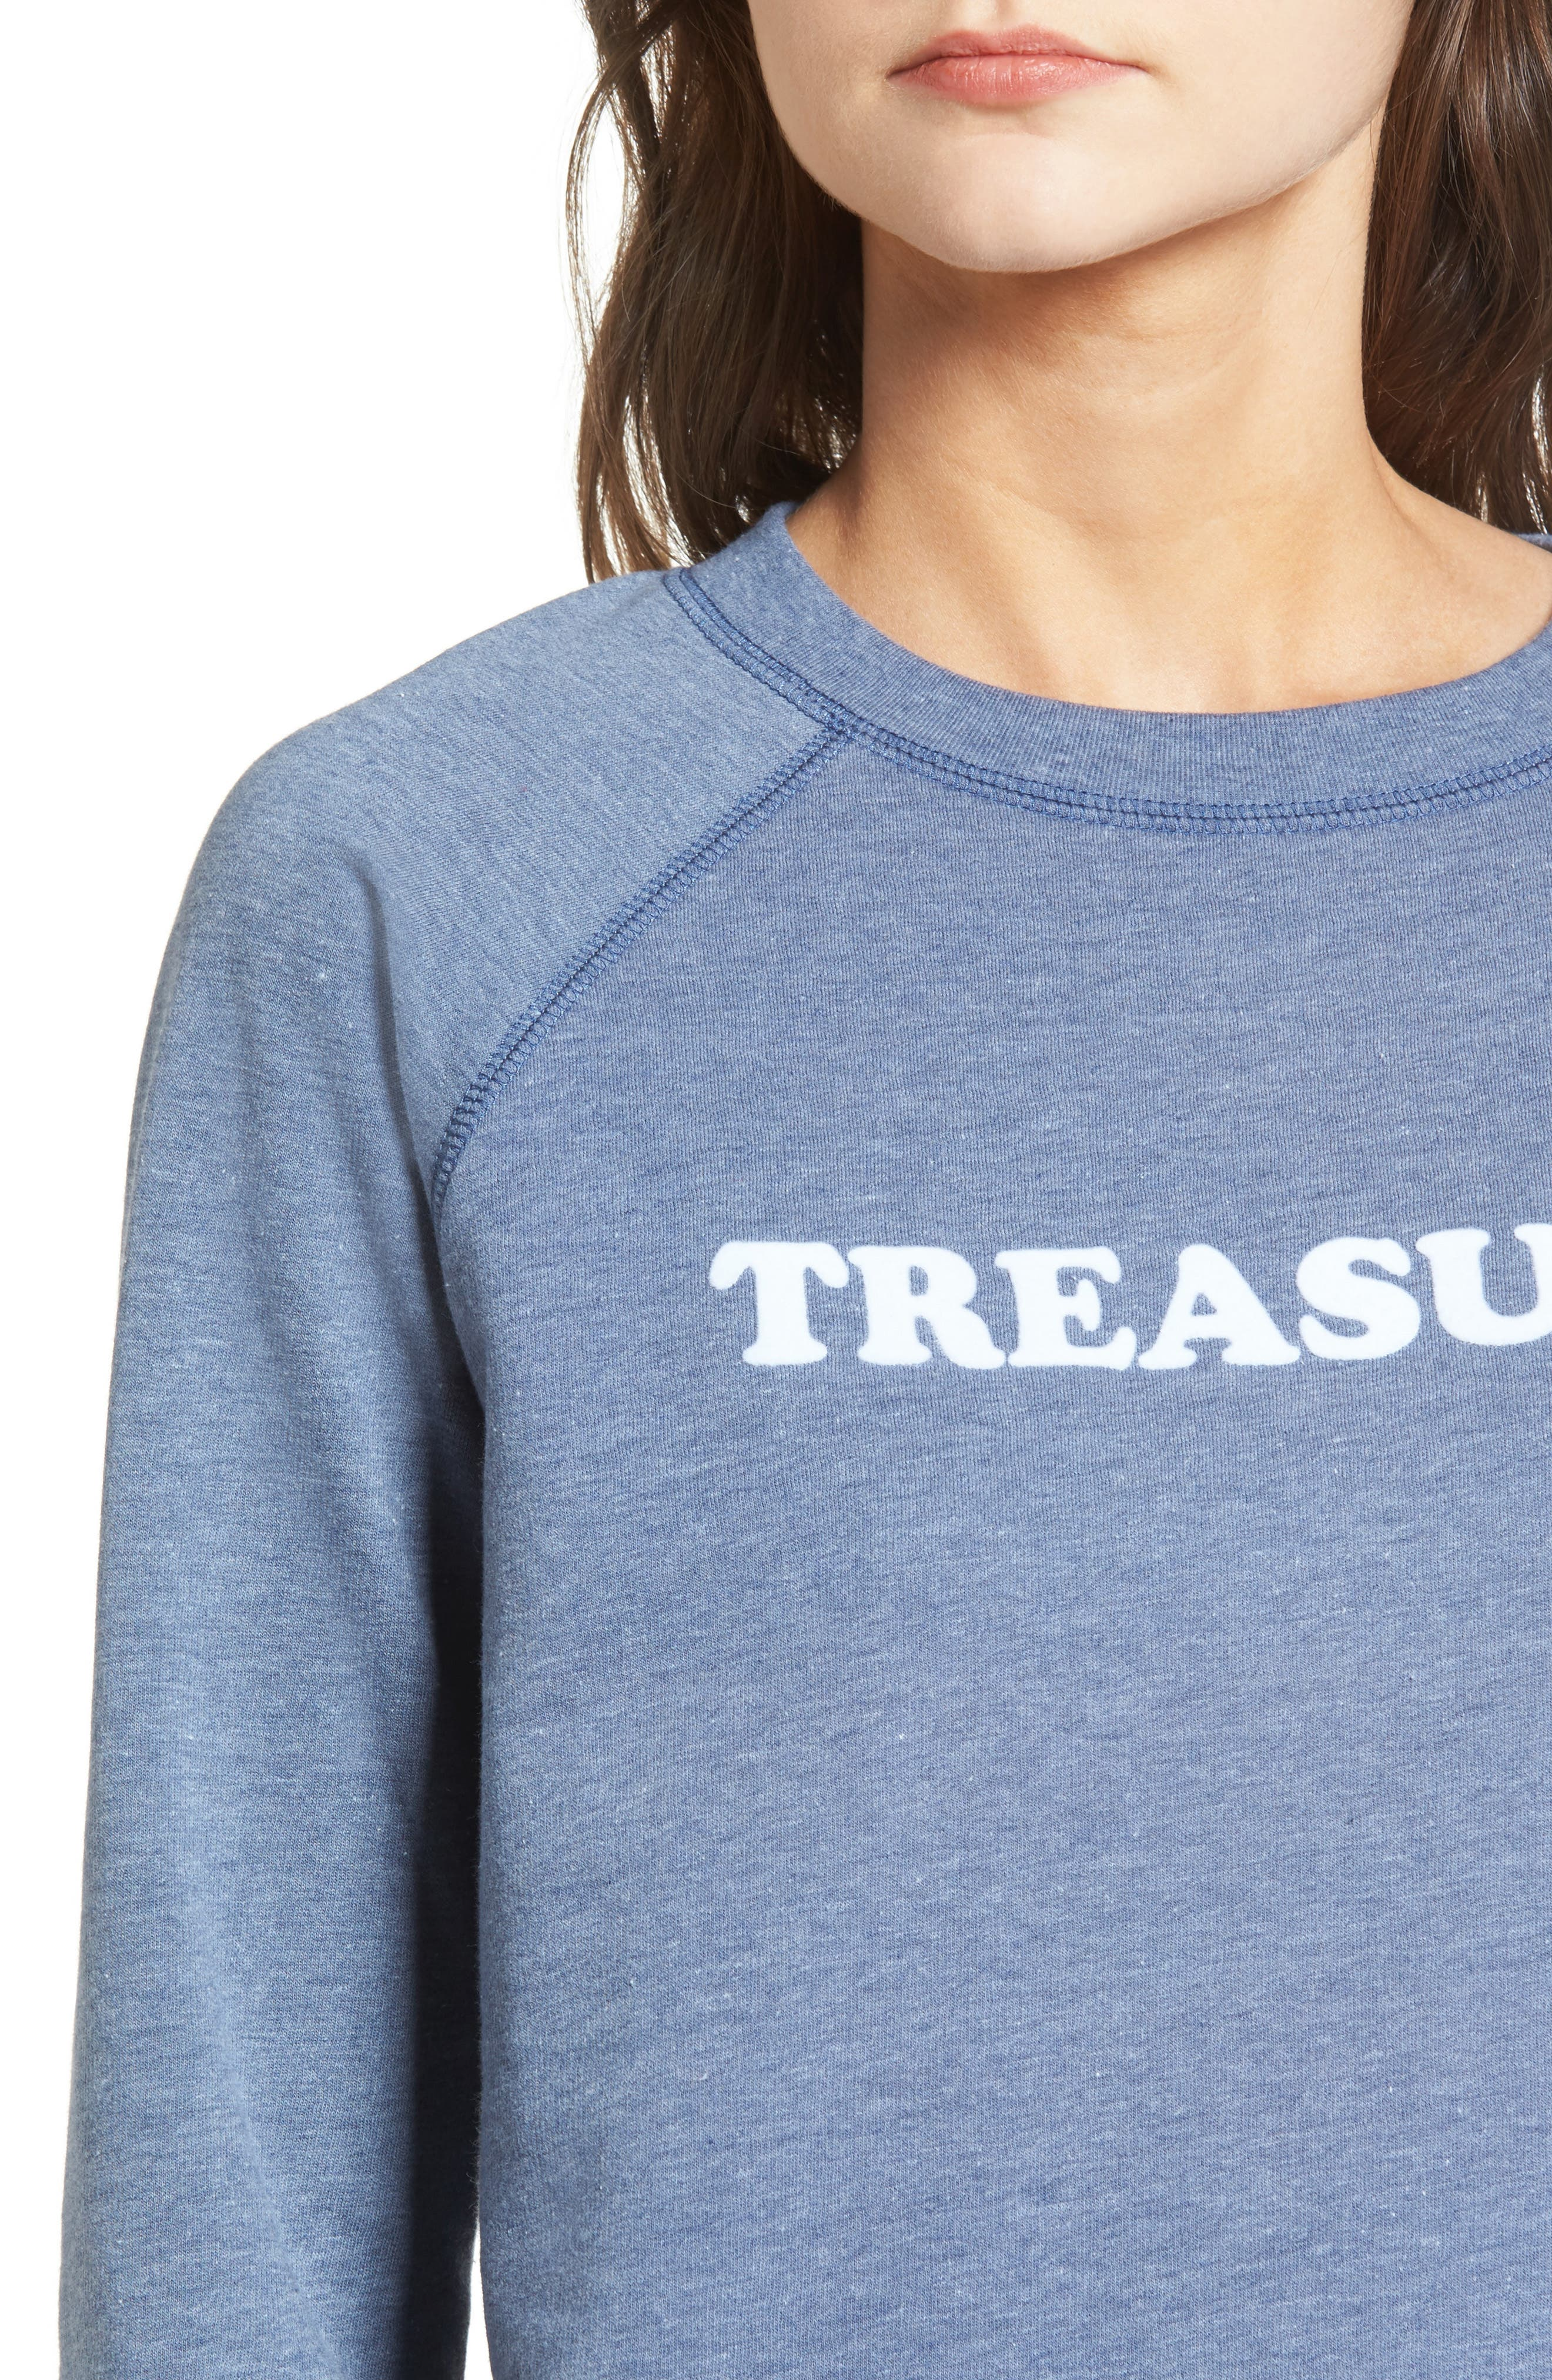 Crewneck Sweatshirt,                             Alternate thumbnail 4, color,                             Blue Insignia Treasure